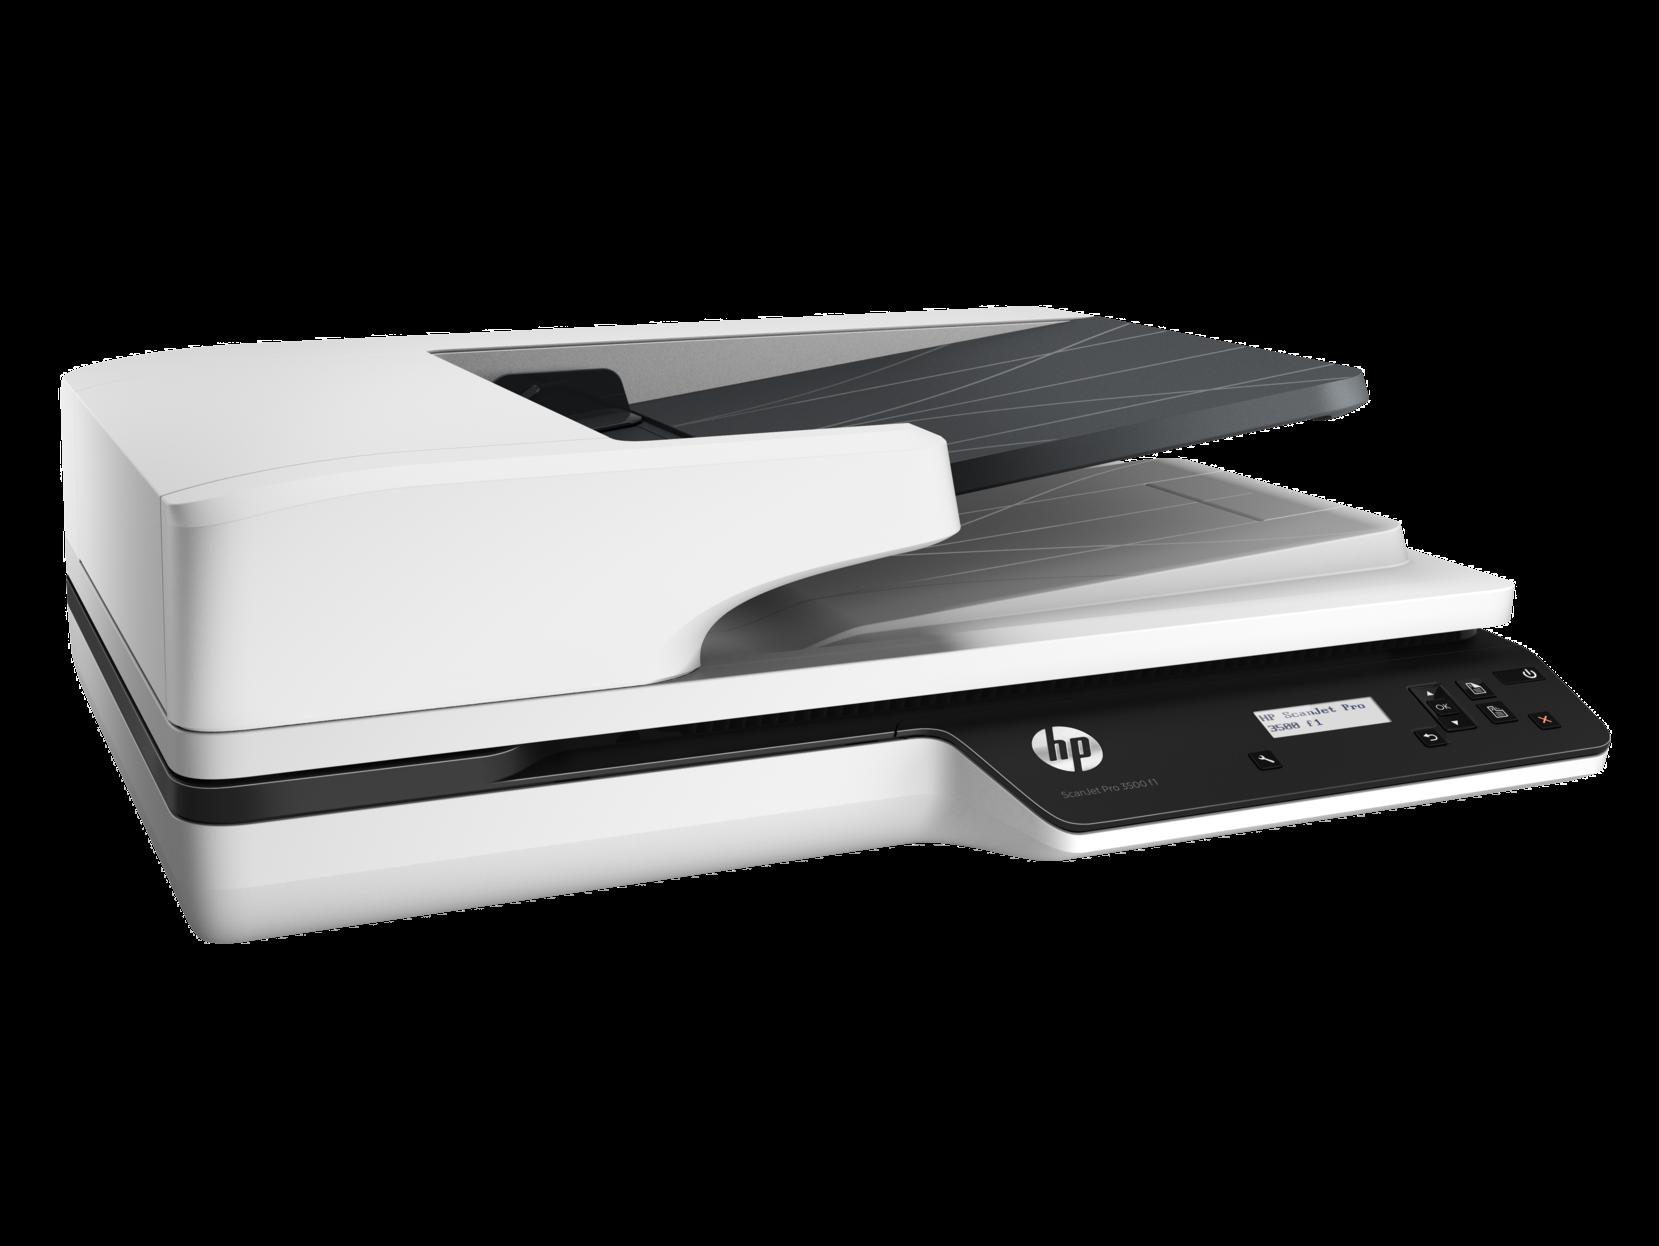 Scanner HD PNG - 95290